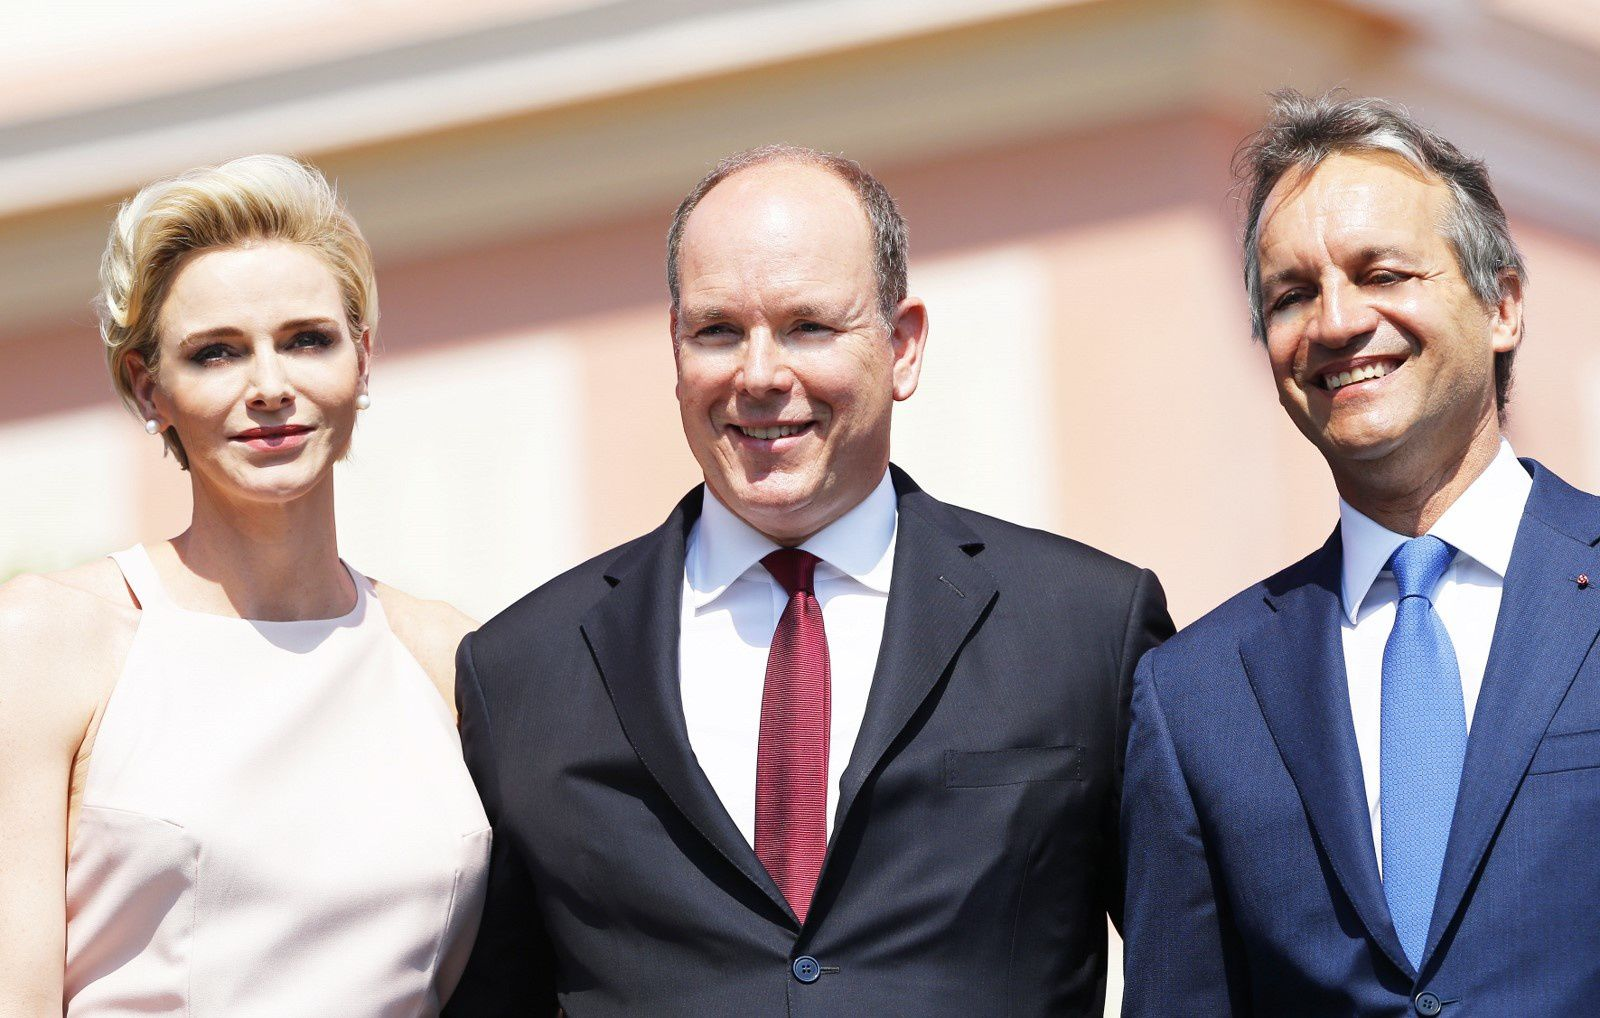 L.L.A.A.S.S. les Princes de Monaco et M. George Marsan, Meire de Monaco - (c) Claudia ALBUQUERQUE/RM